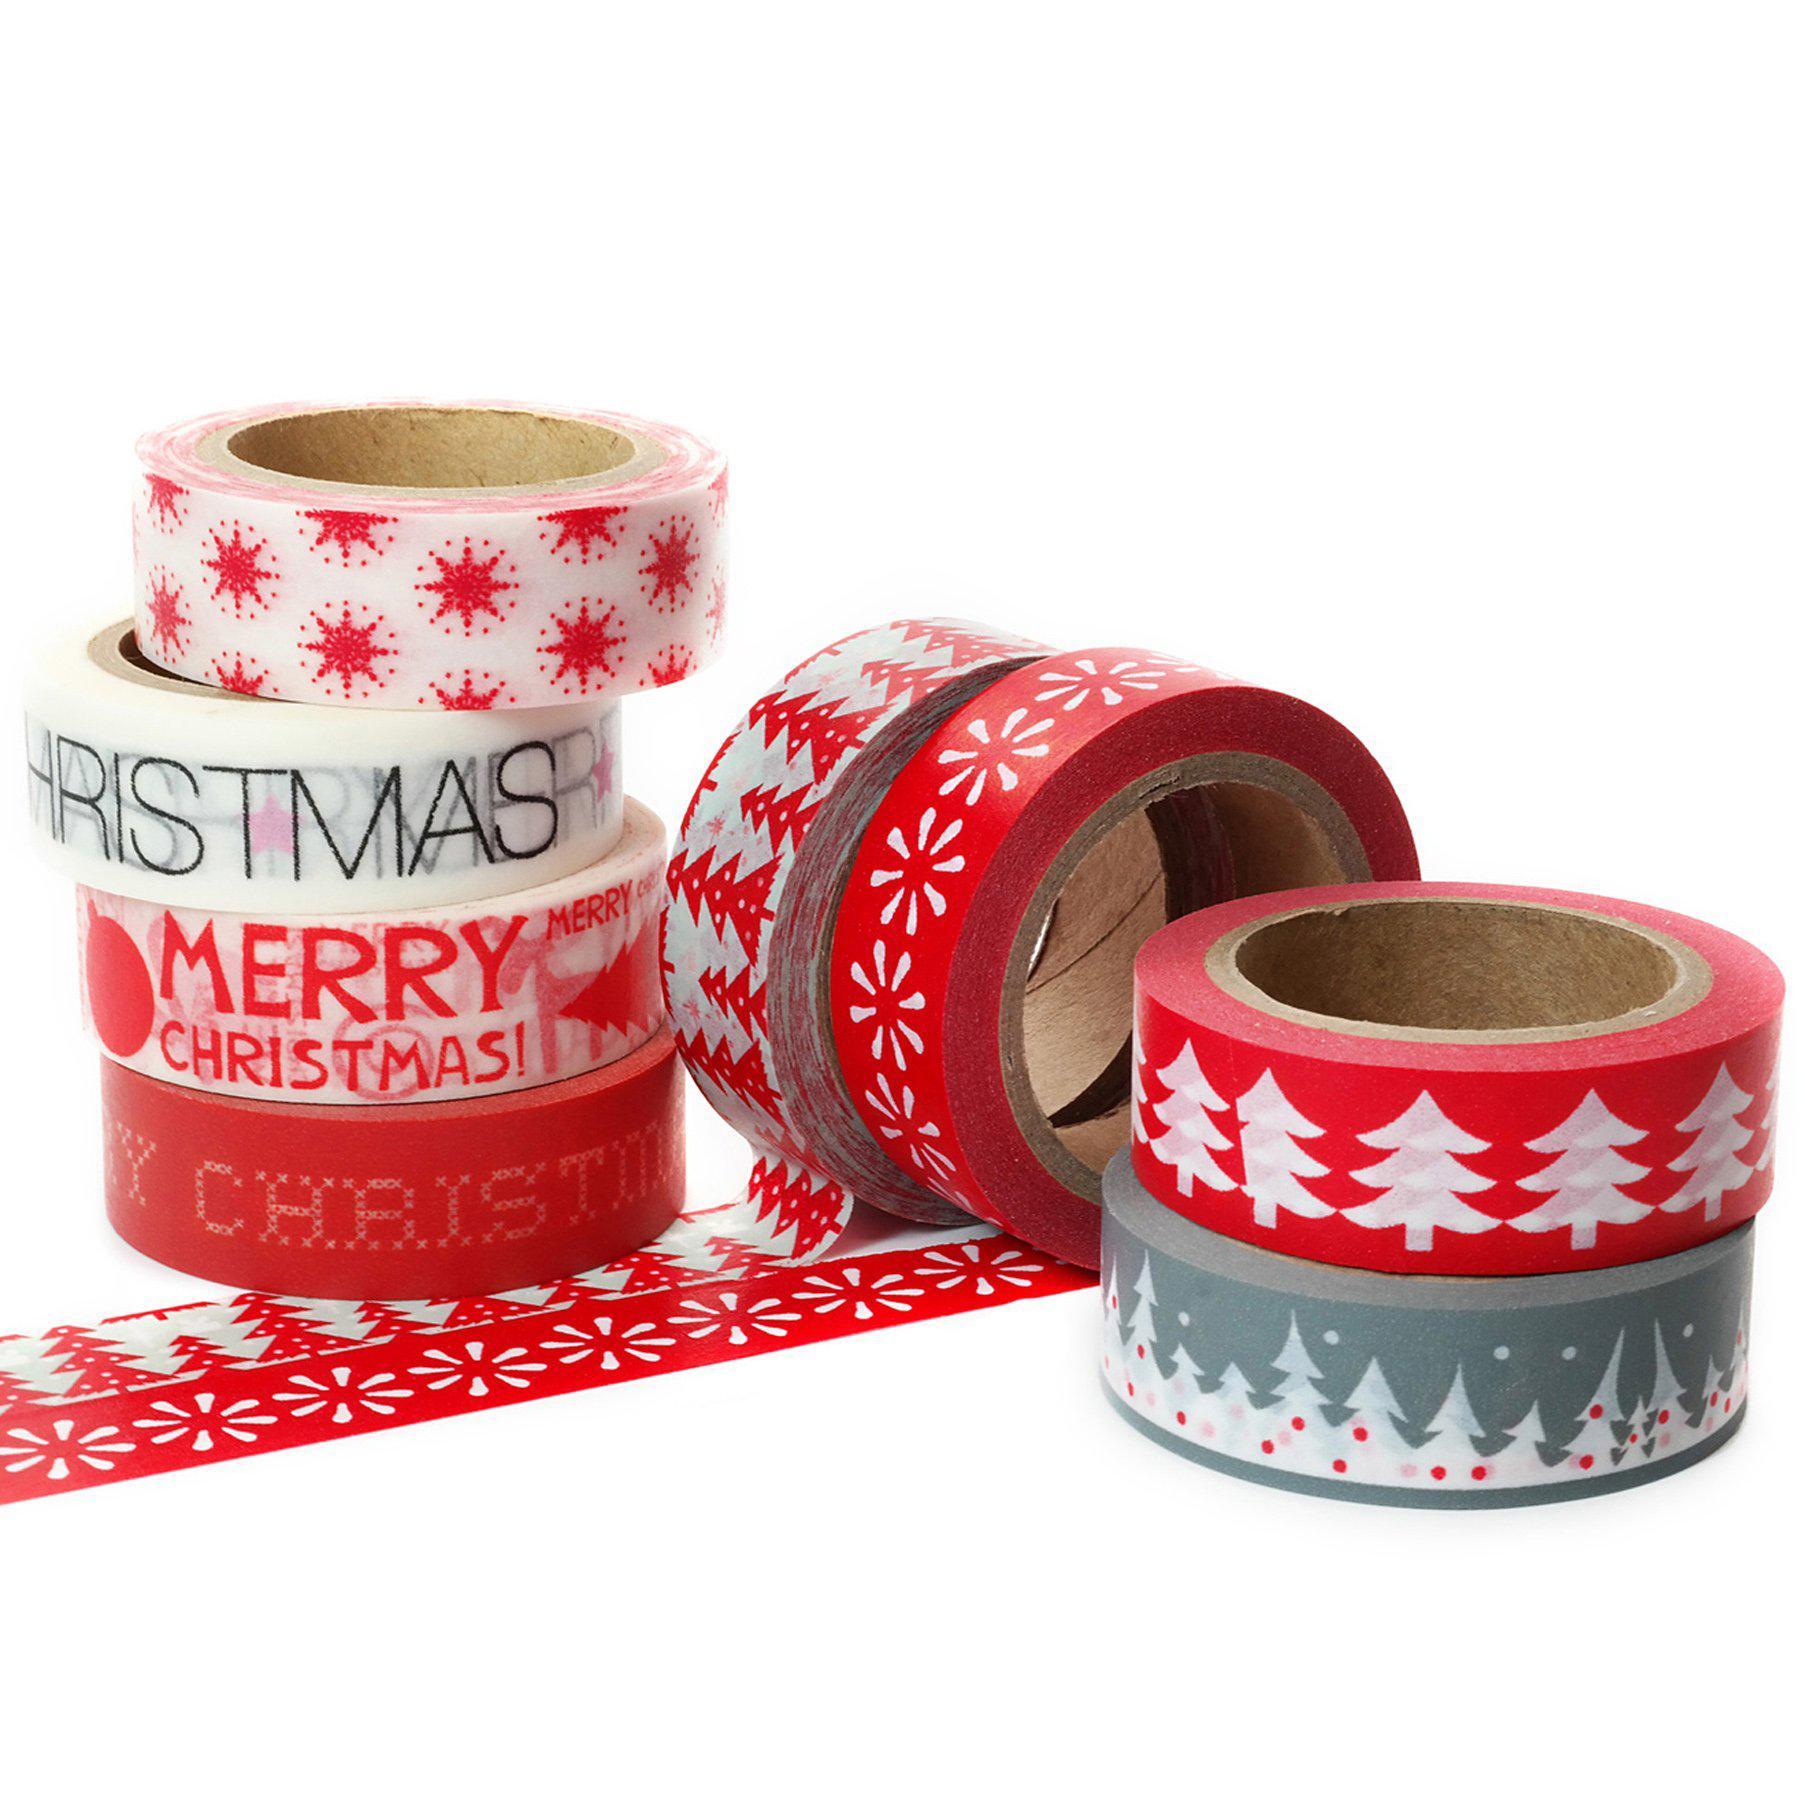 Wholesale custom printed assorted design washi tape decorative school stationery 2